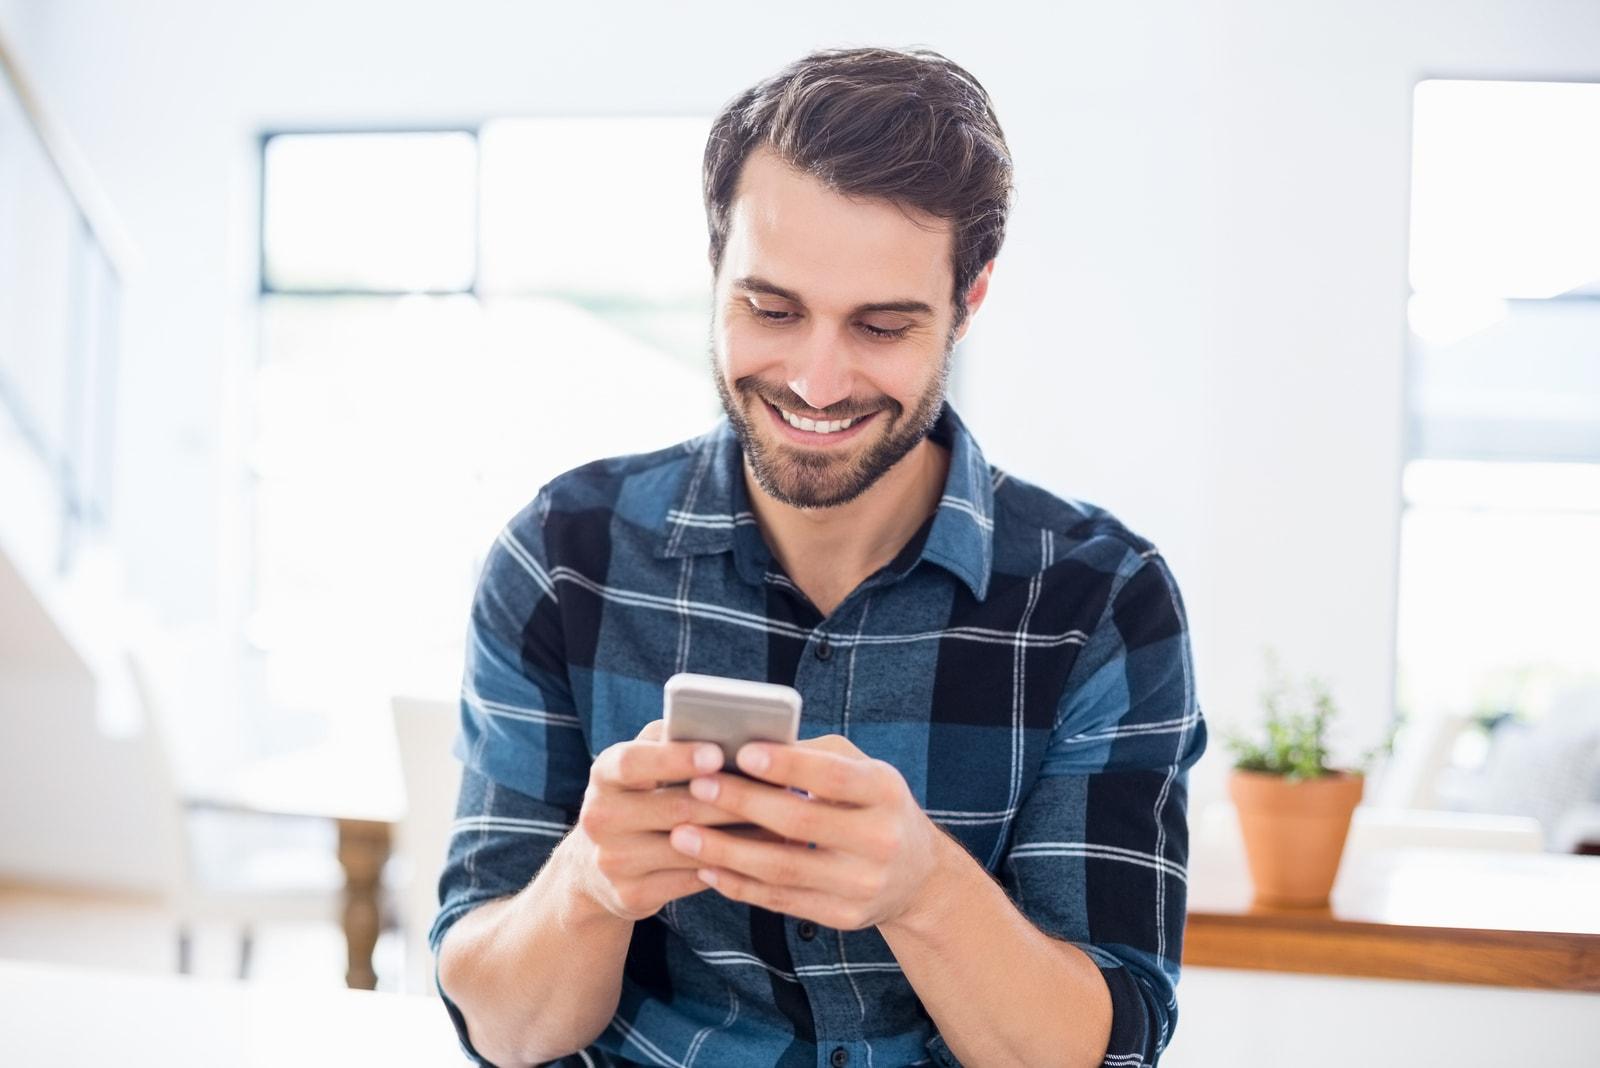 smiling man using his phone